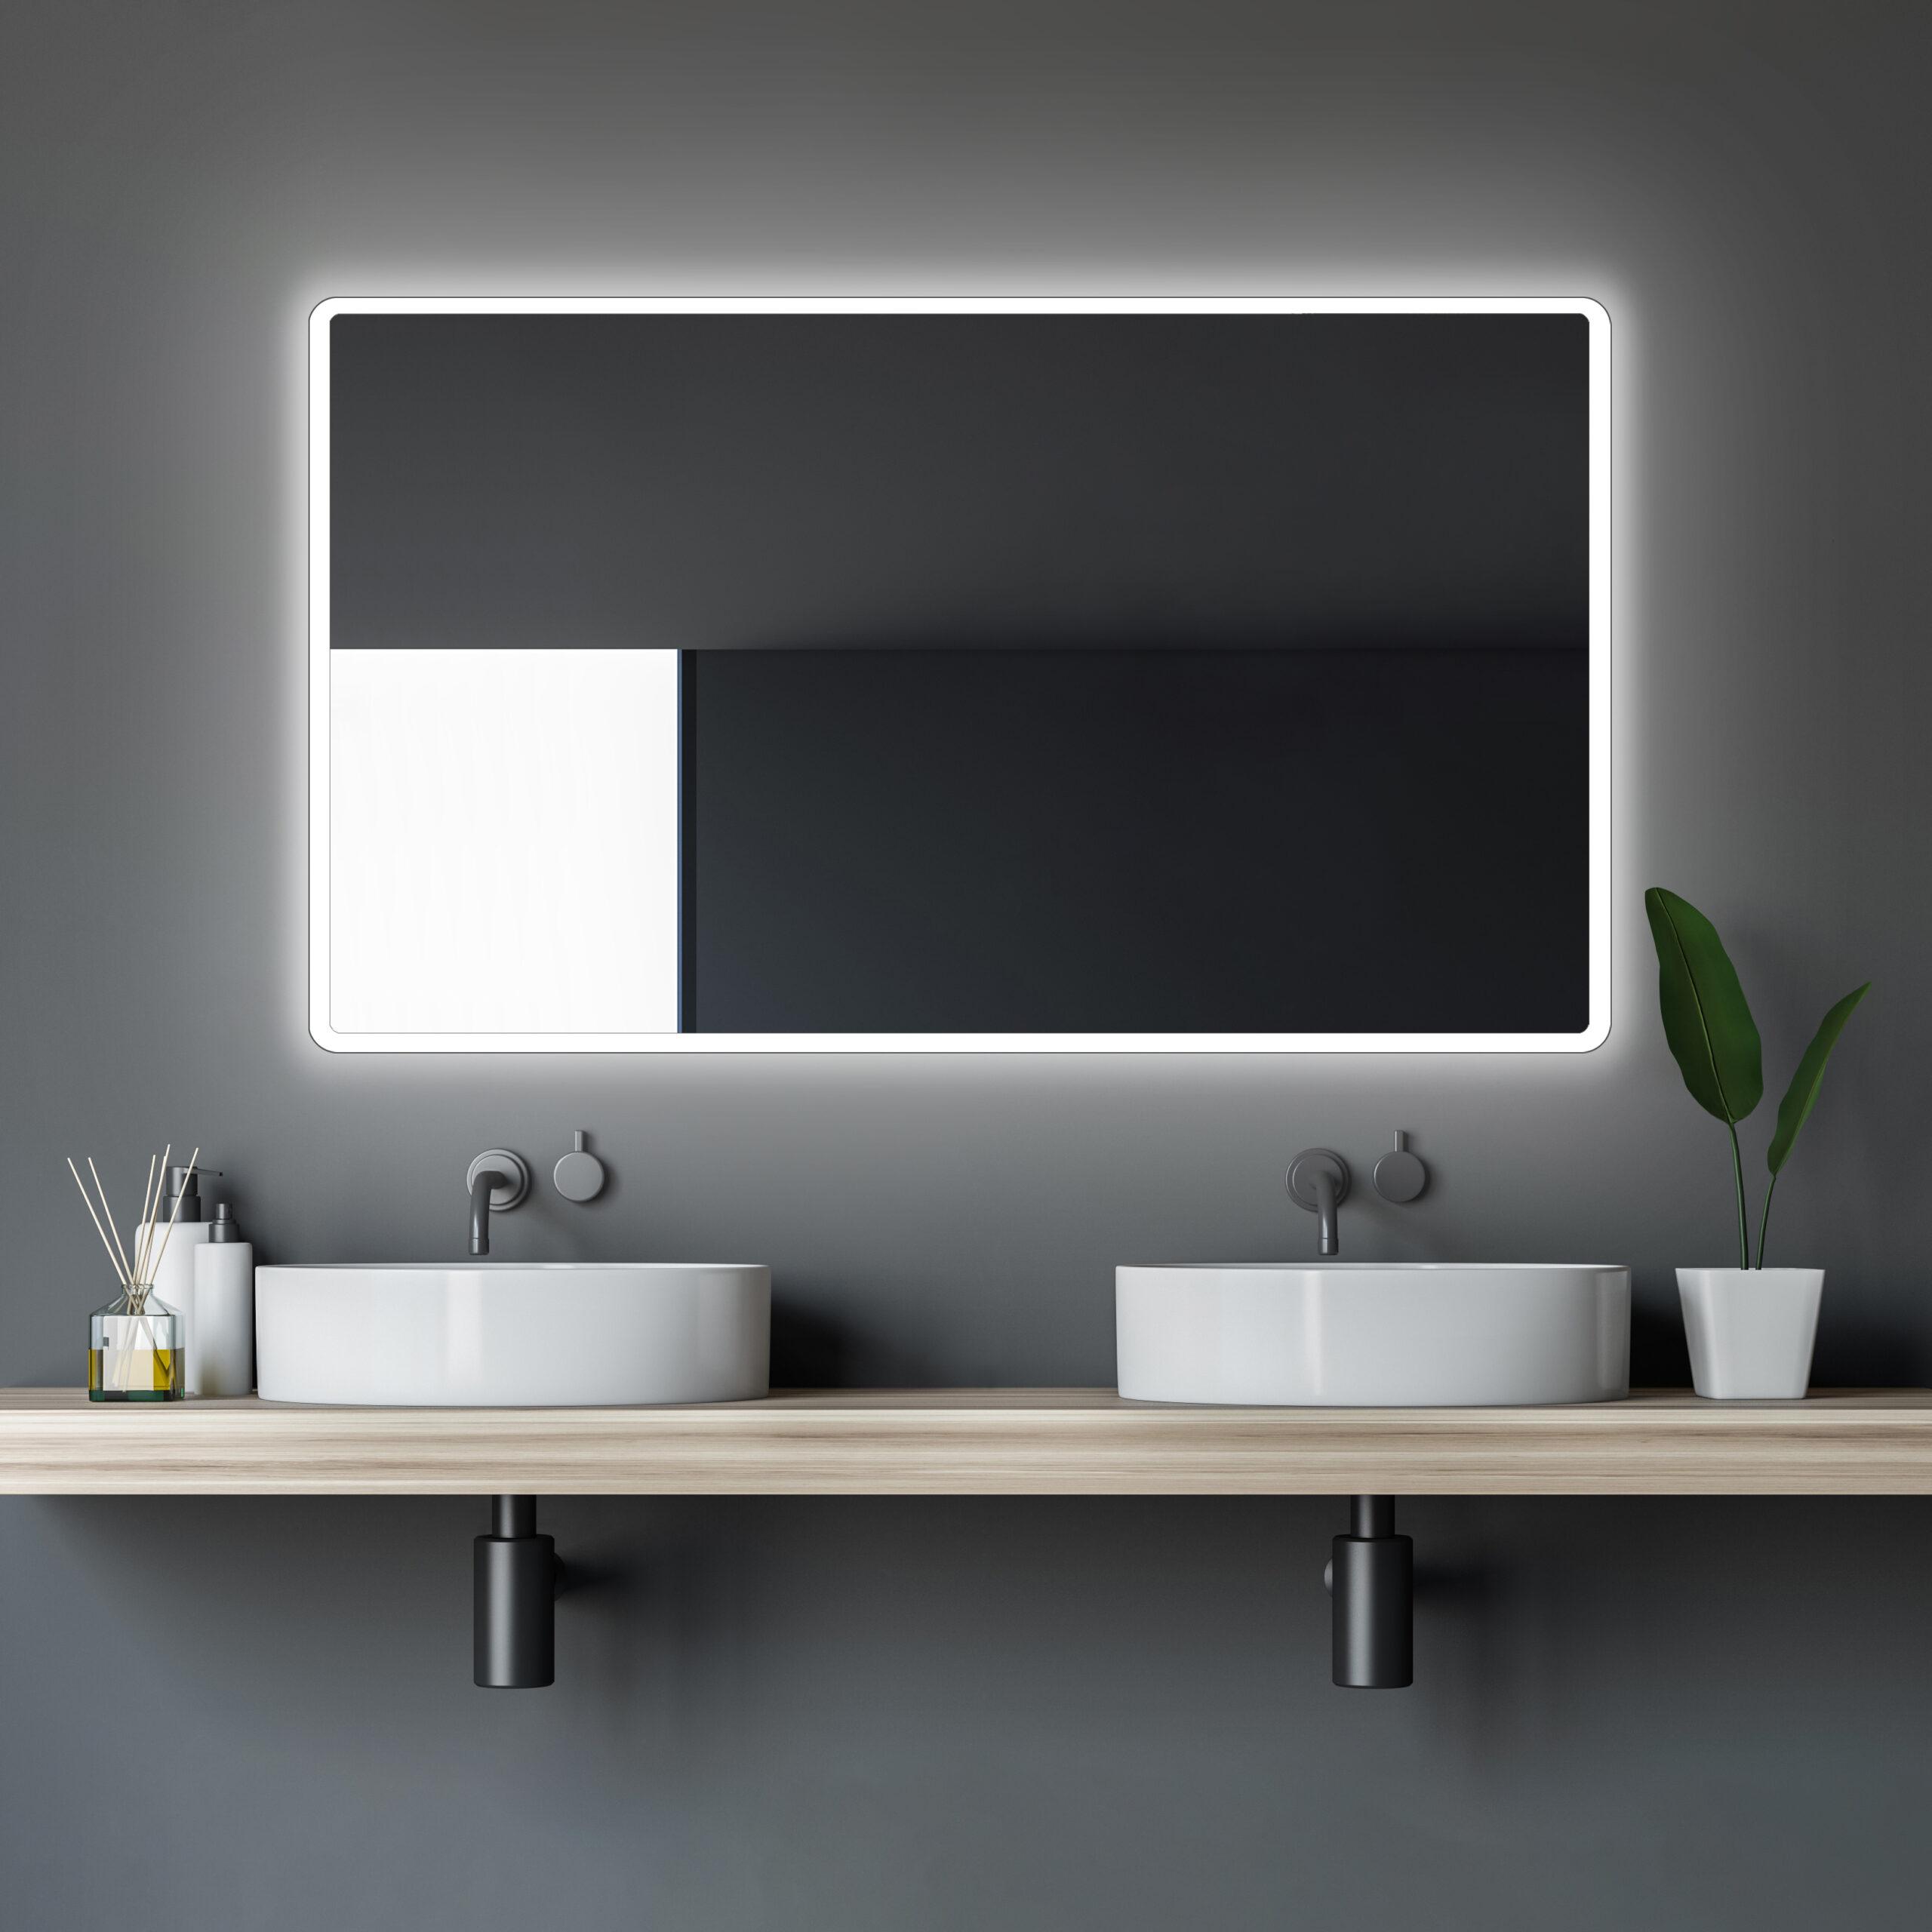 Bathroom Mirror With Lighting Talos Moon Lichtspiegel Shop